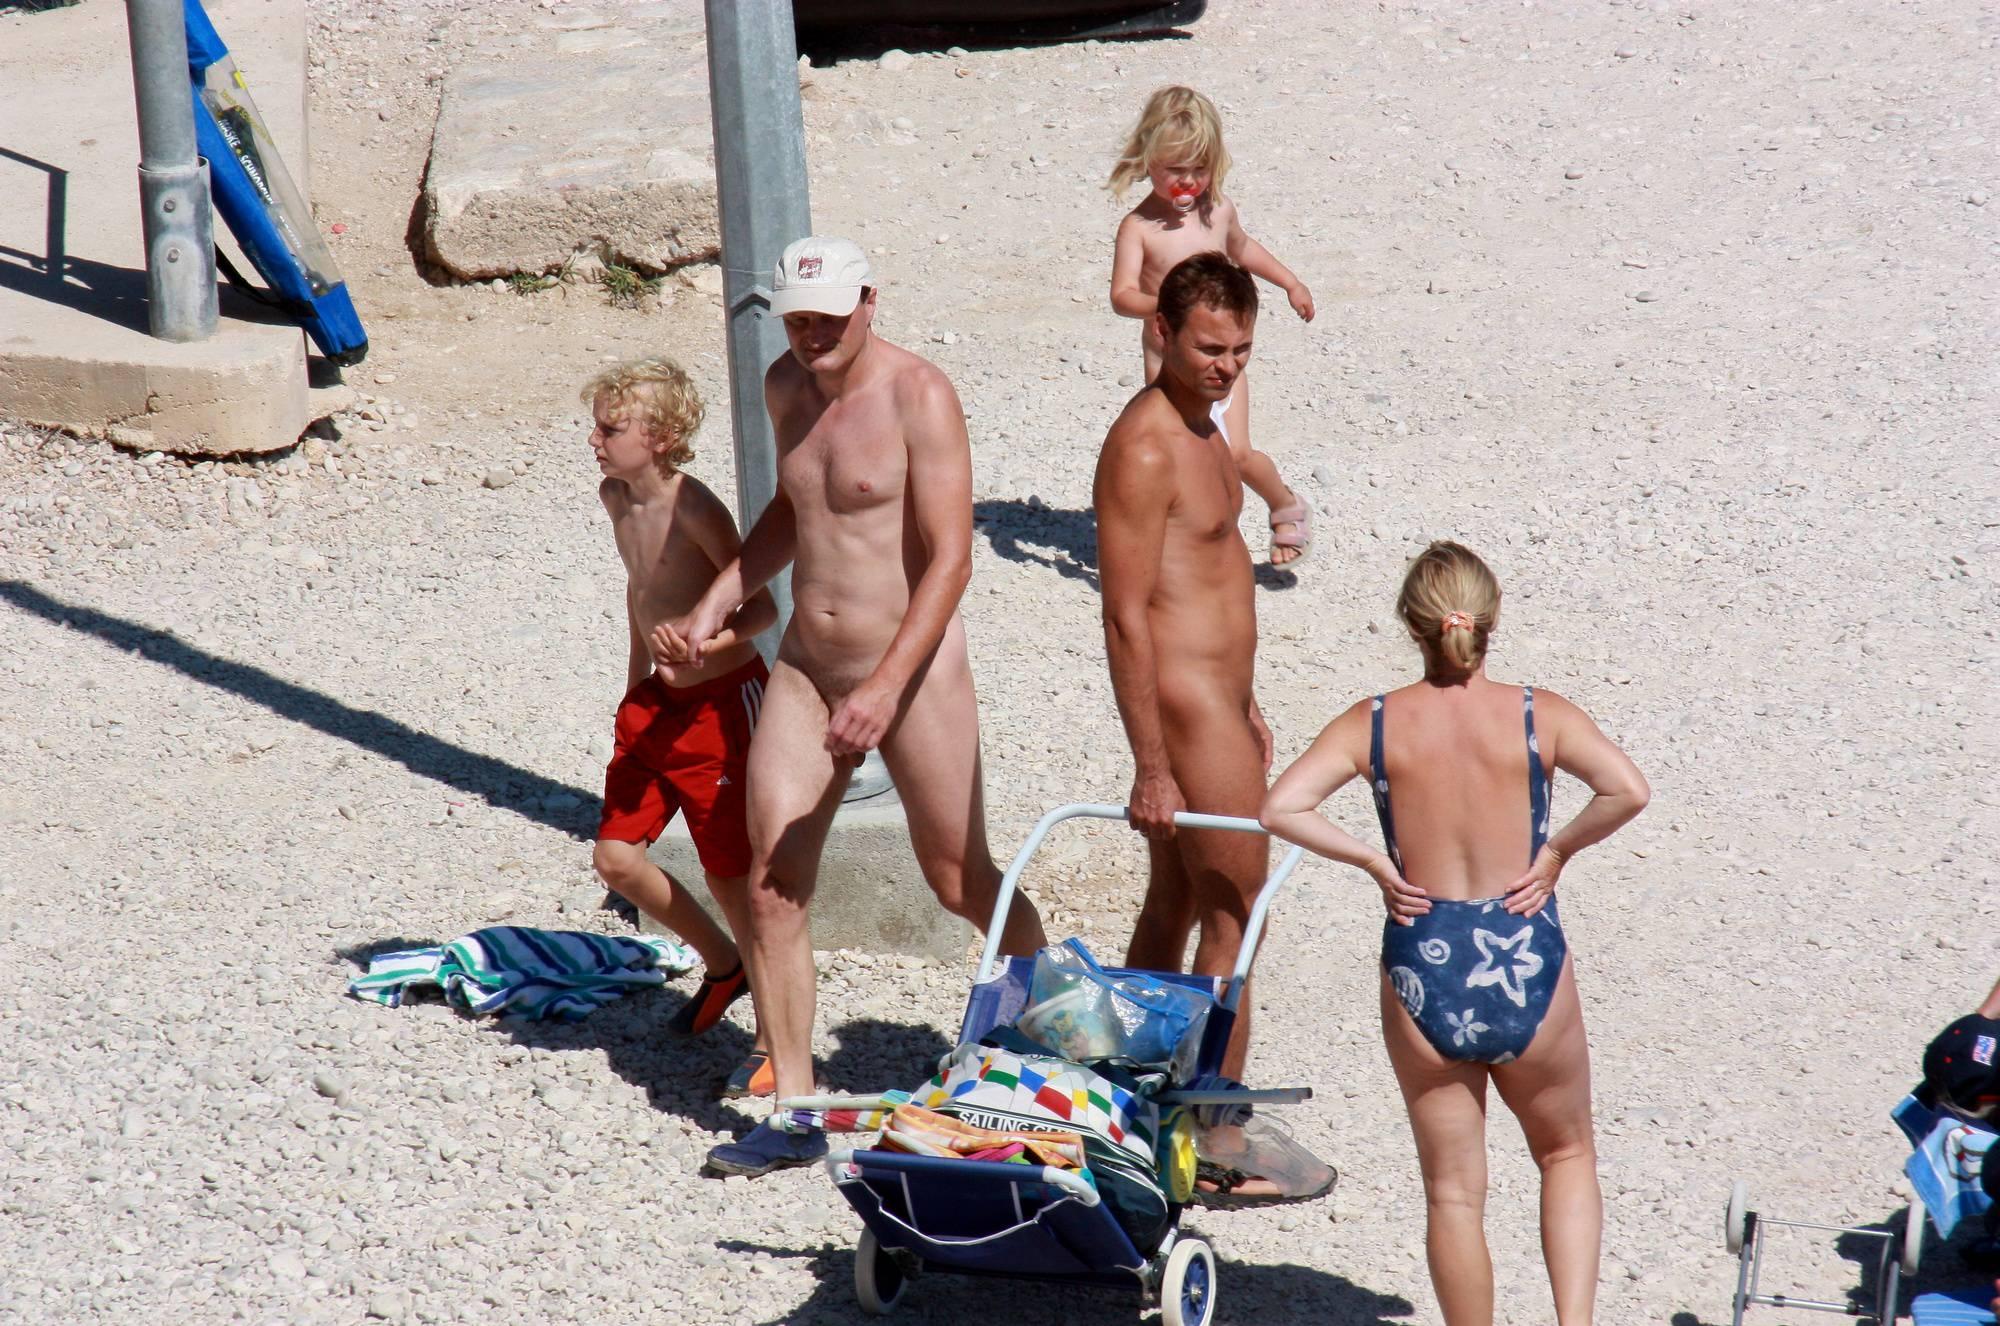 Nudist Photos Boy and His Dad Beach Walk - 1